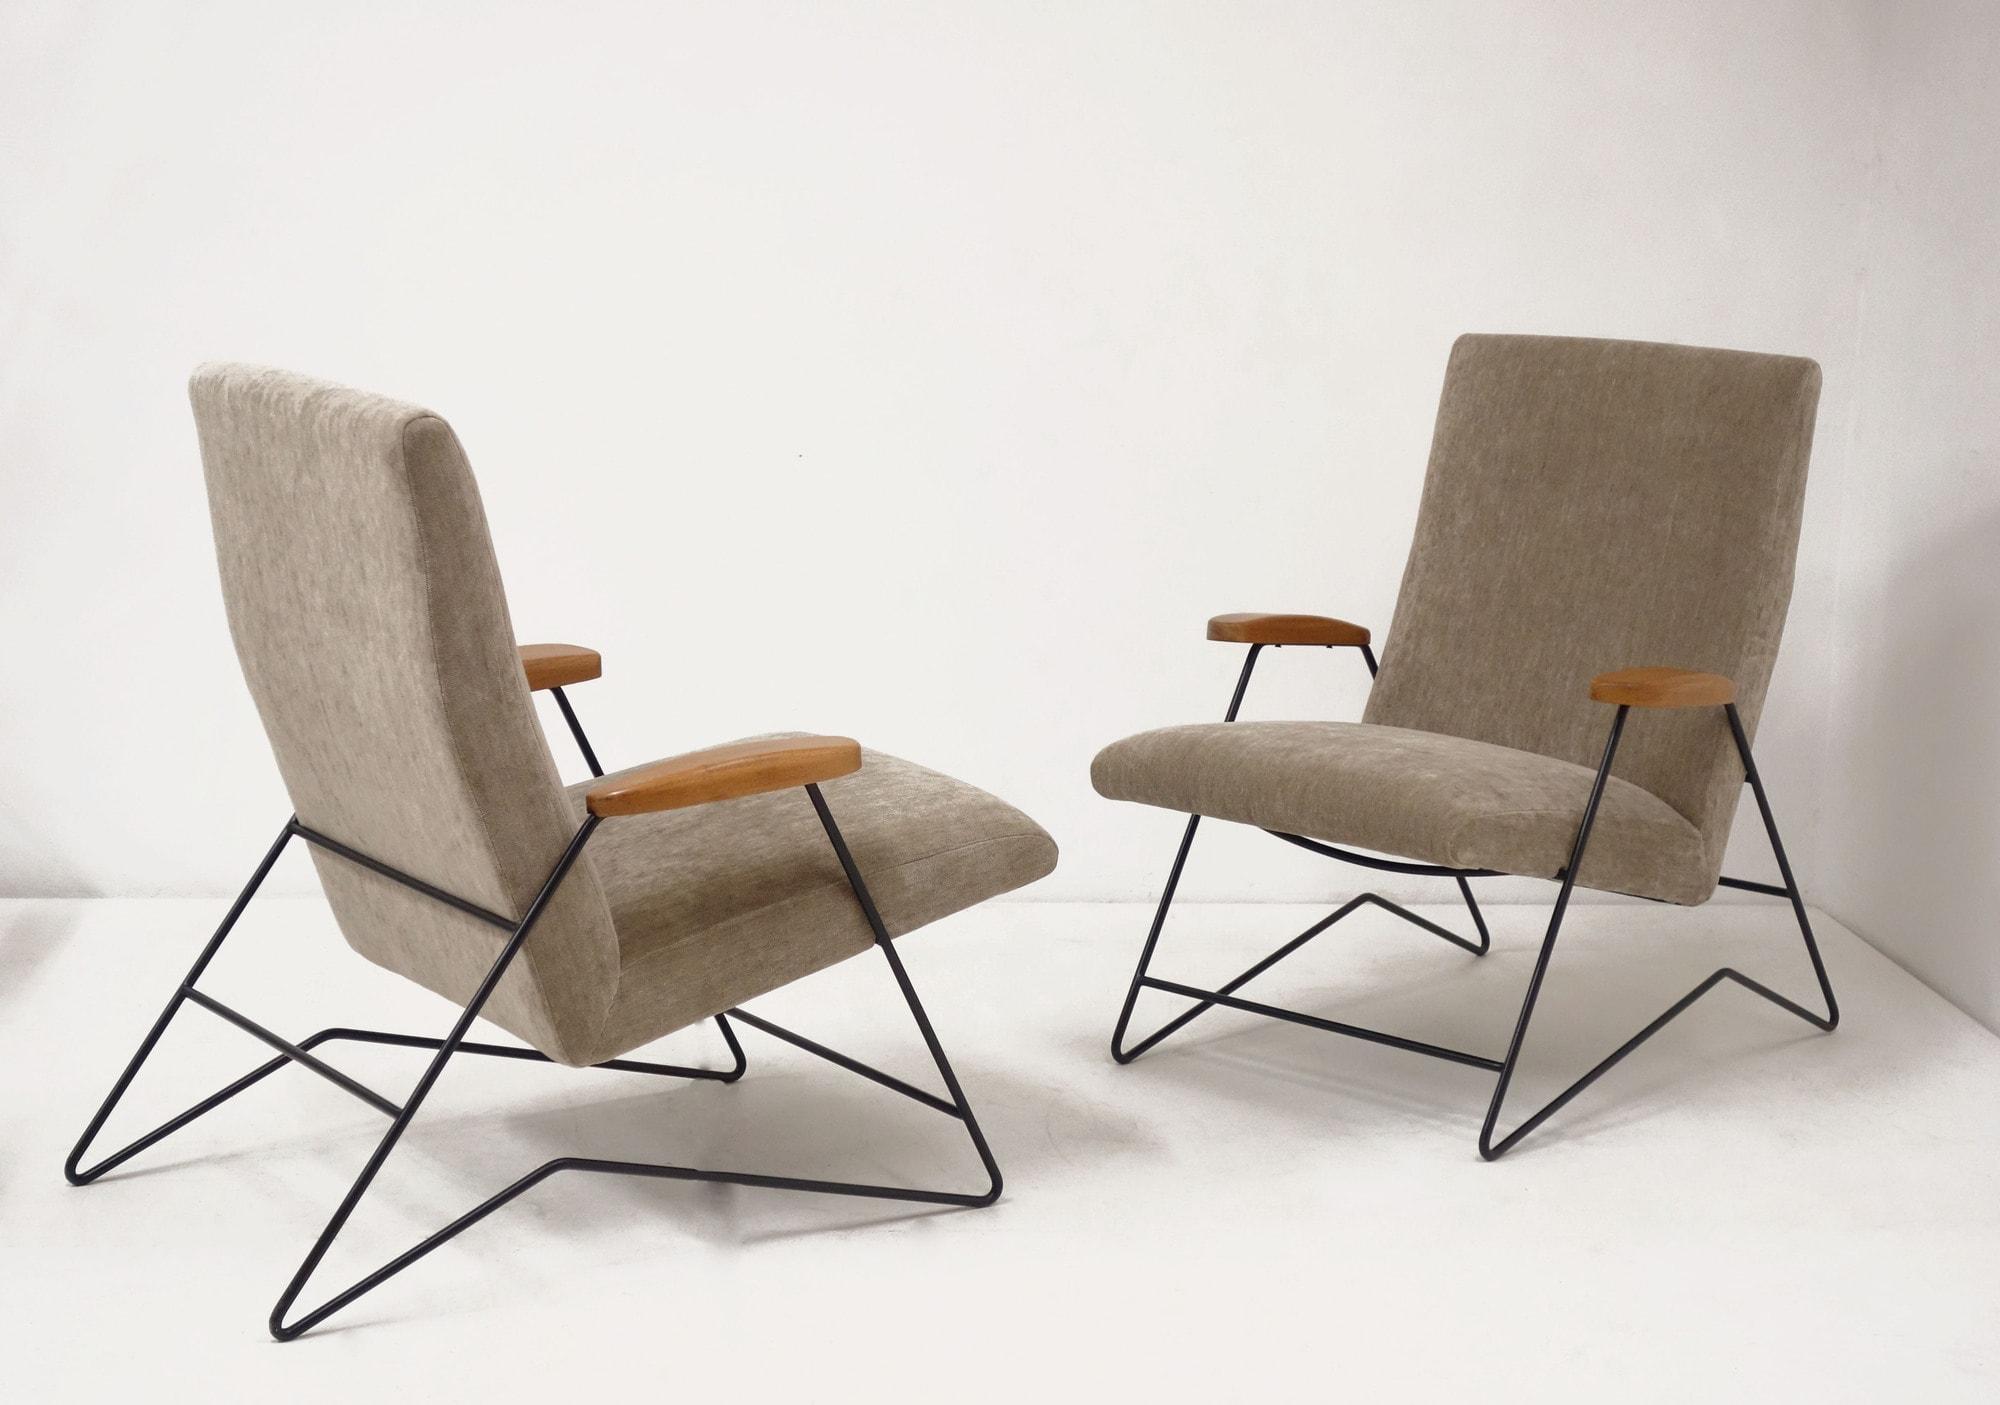 Carlo Hauner & Martin Eisler, Pair of armchairs, vue 02